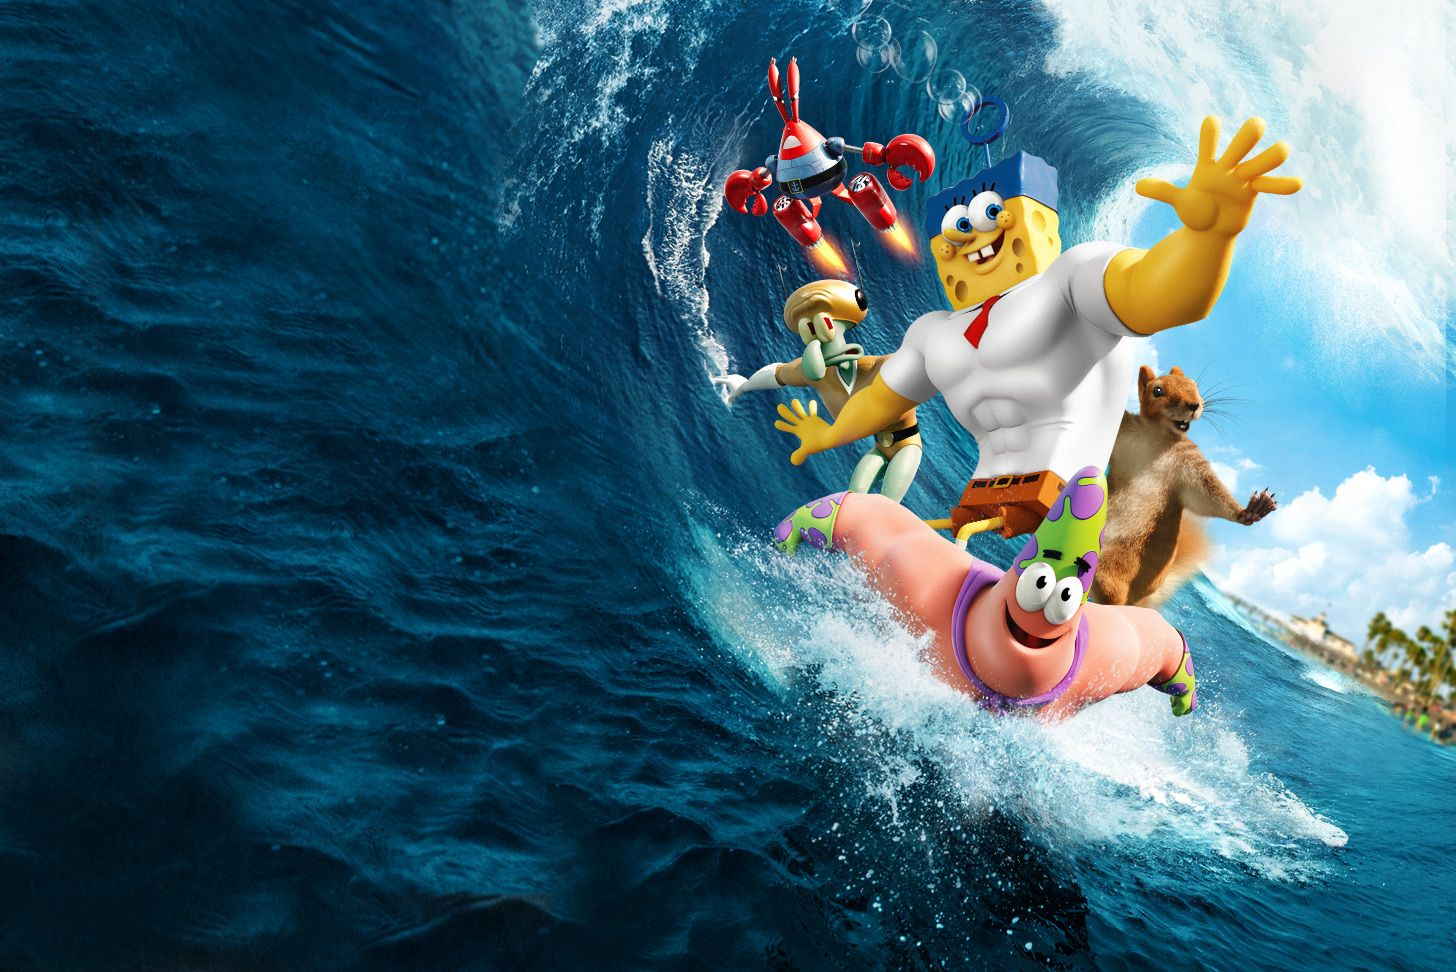 3d The Spongebob Movie Sponge Out Of Water Wallpaper Free